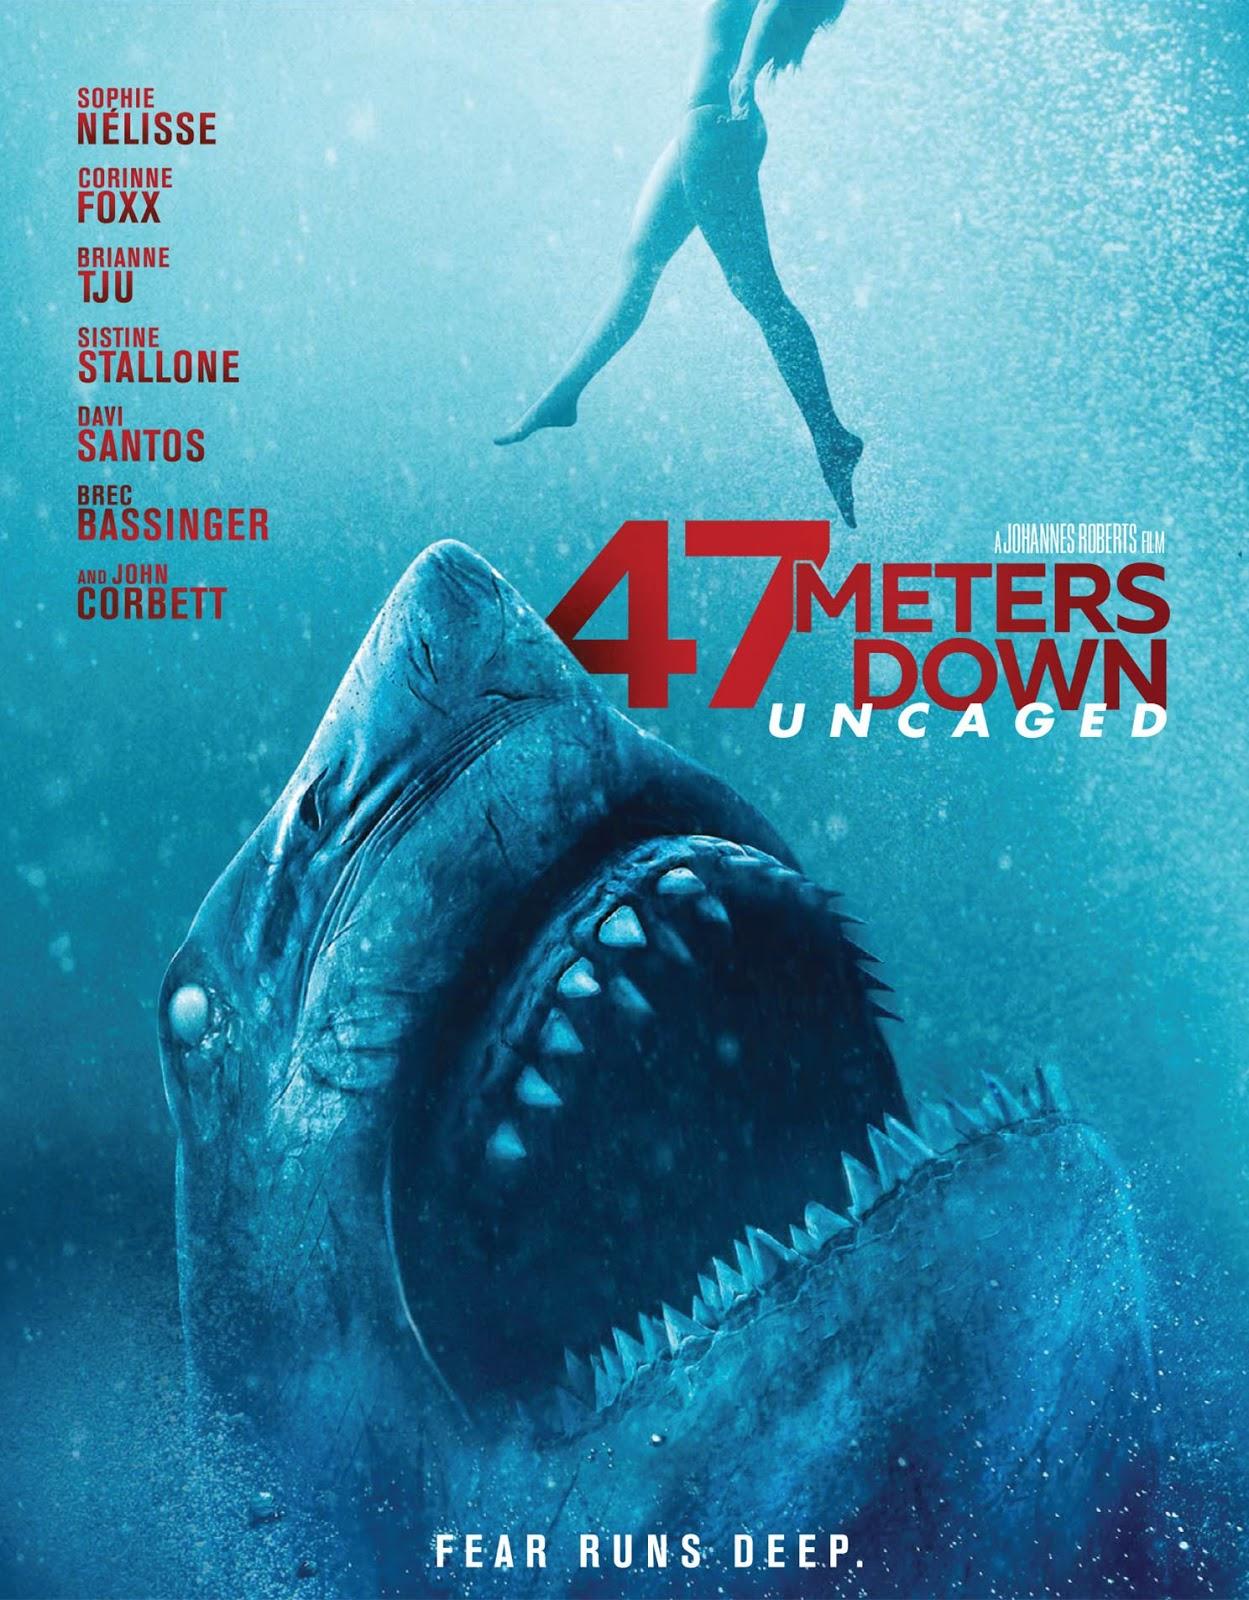 47 Meters Down: Uncaged [2019] [DVDR] [NTSC] [Subtitulado] [V2]